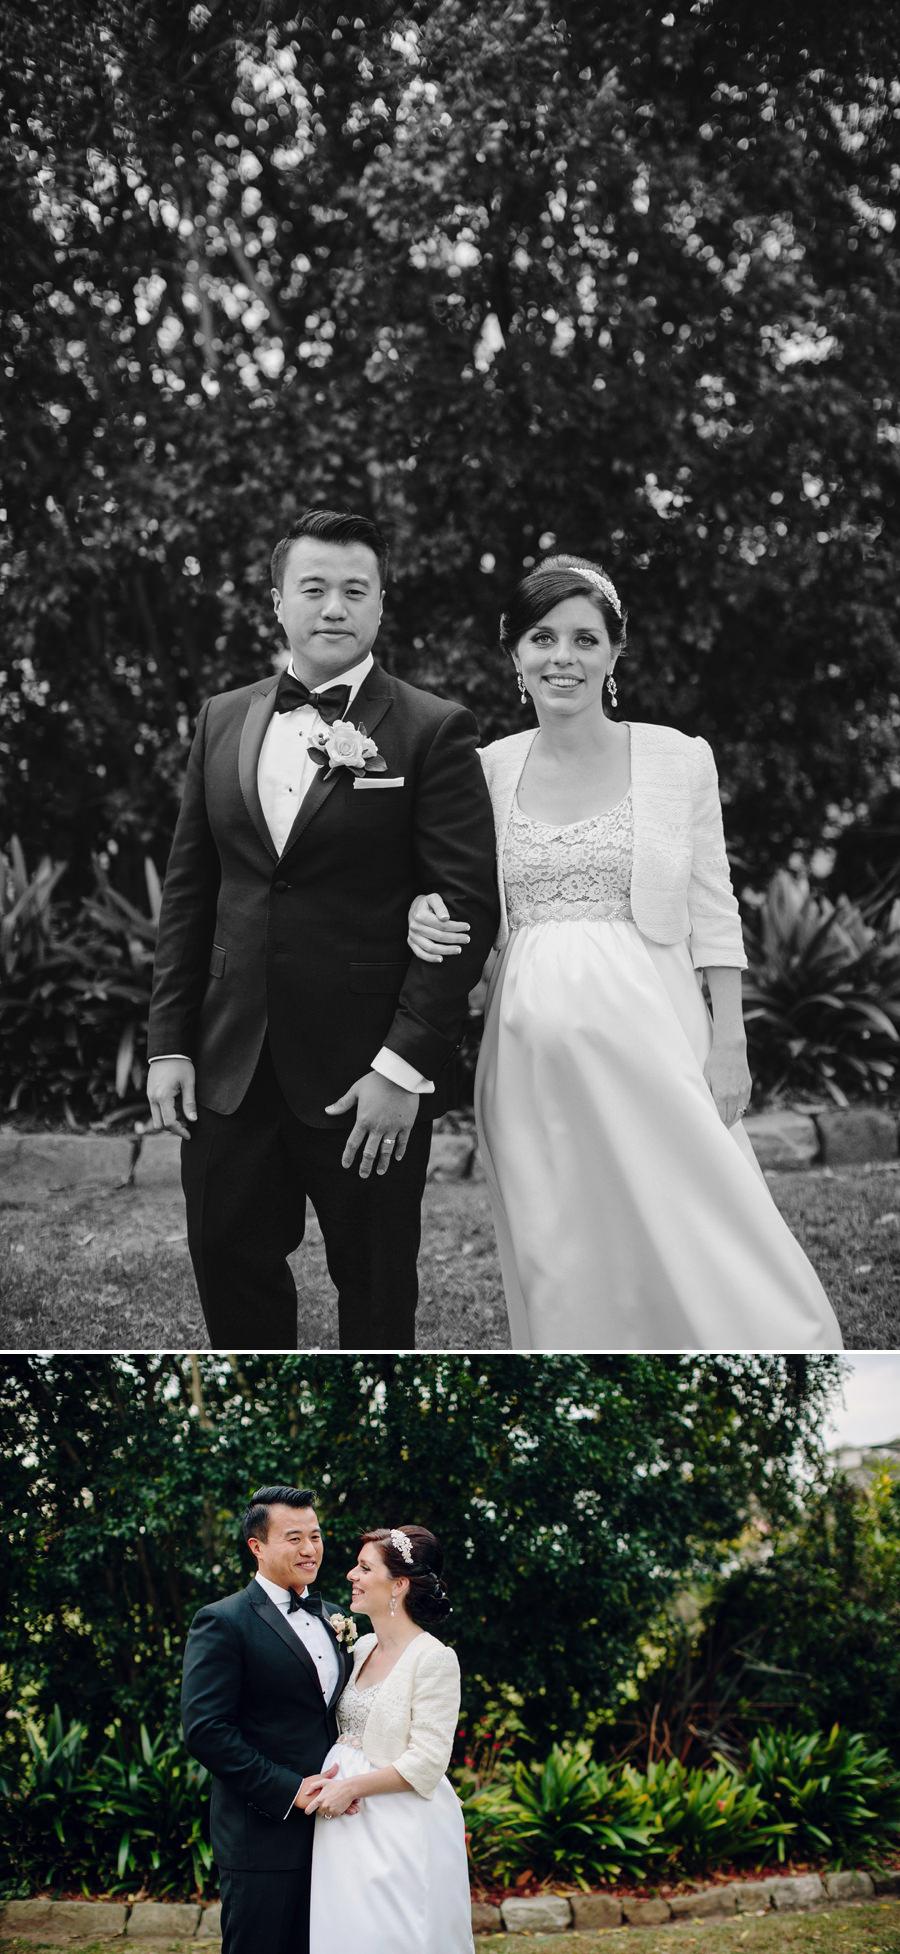 Oatlands Wedding Photographers: Bride & Groom portraits